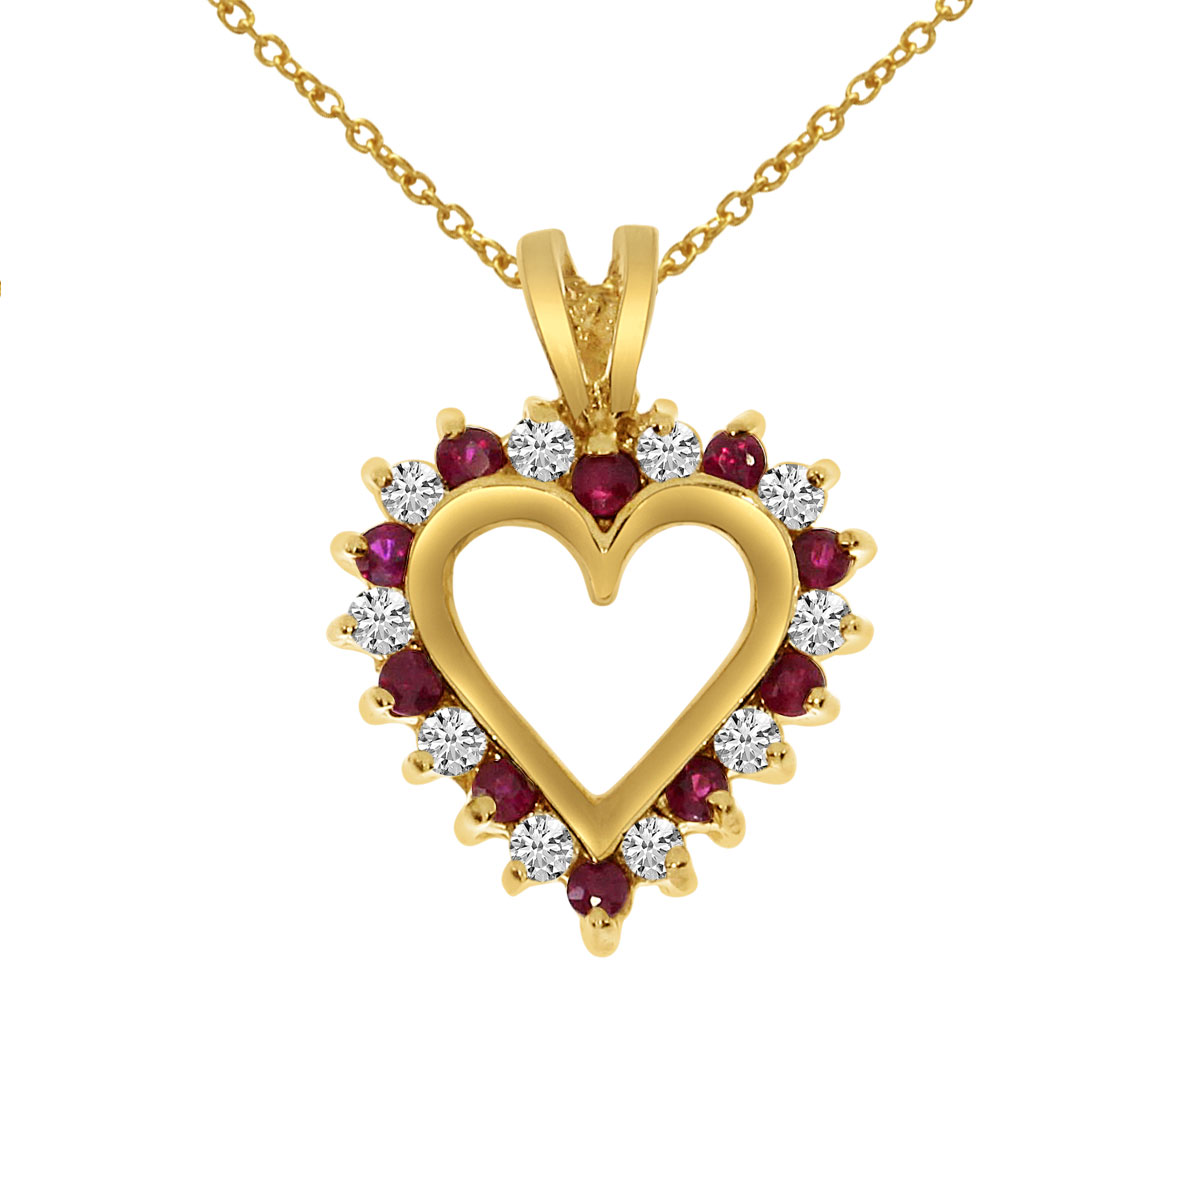 14k Yellow Gold Ruby and Diamond Heart Shaped Pendant